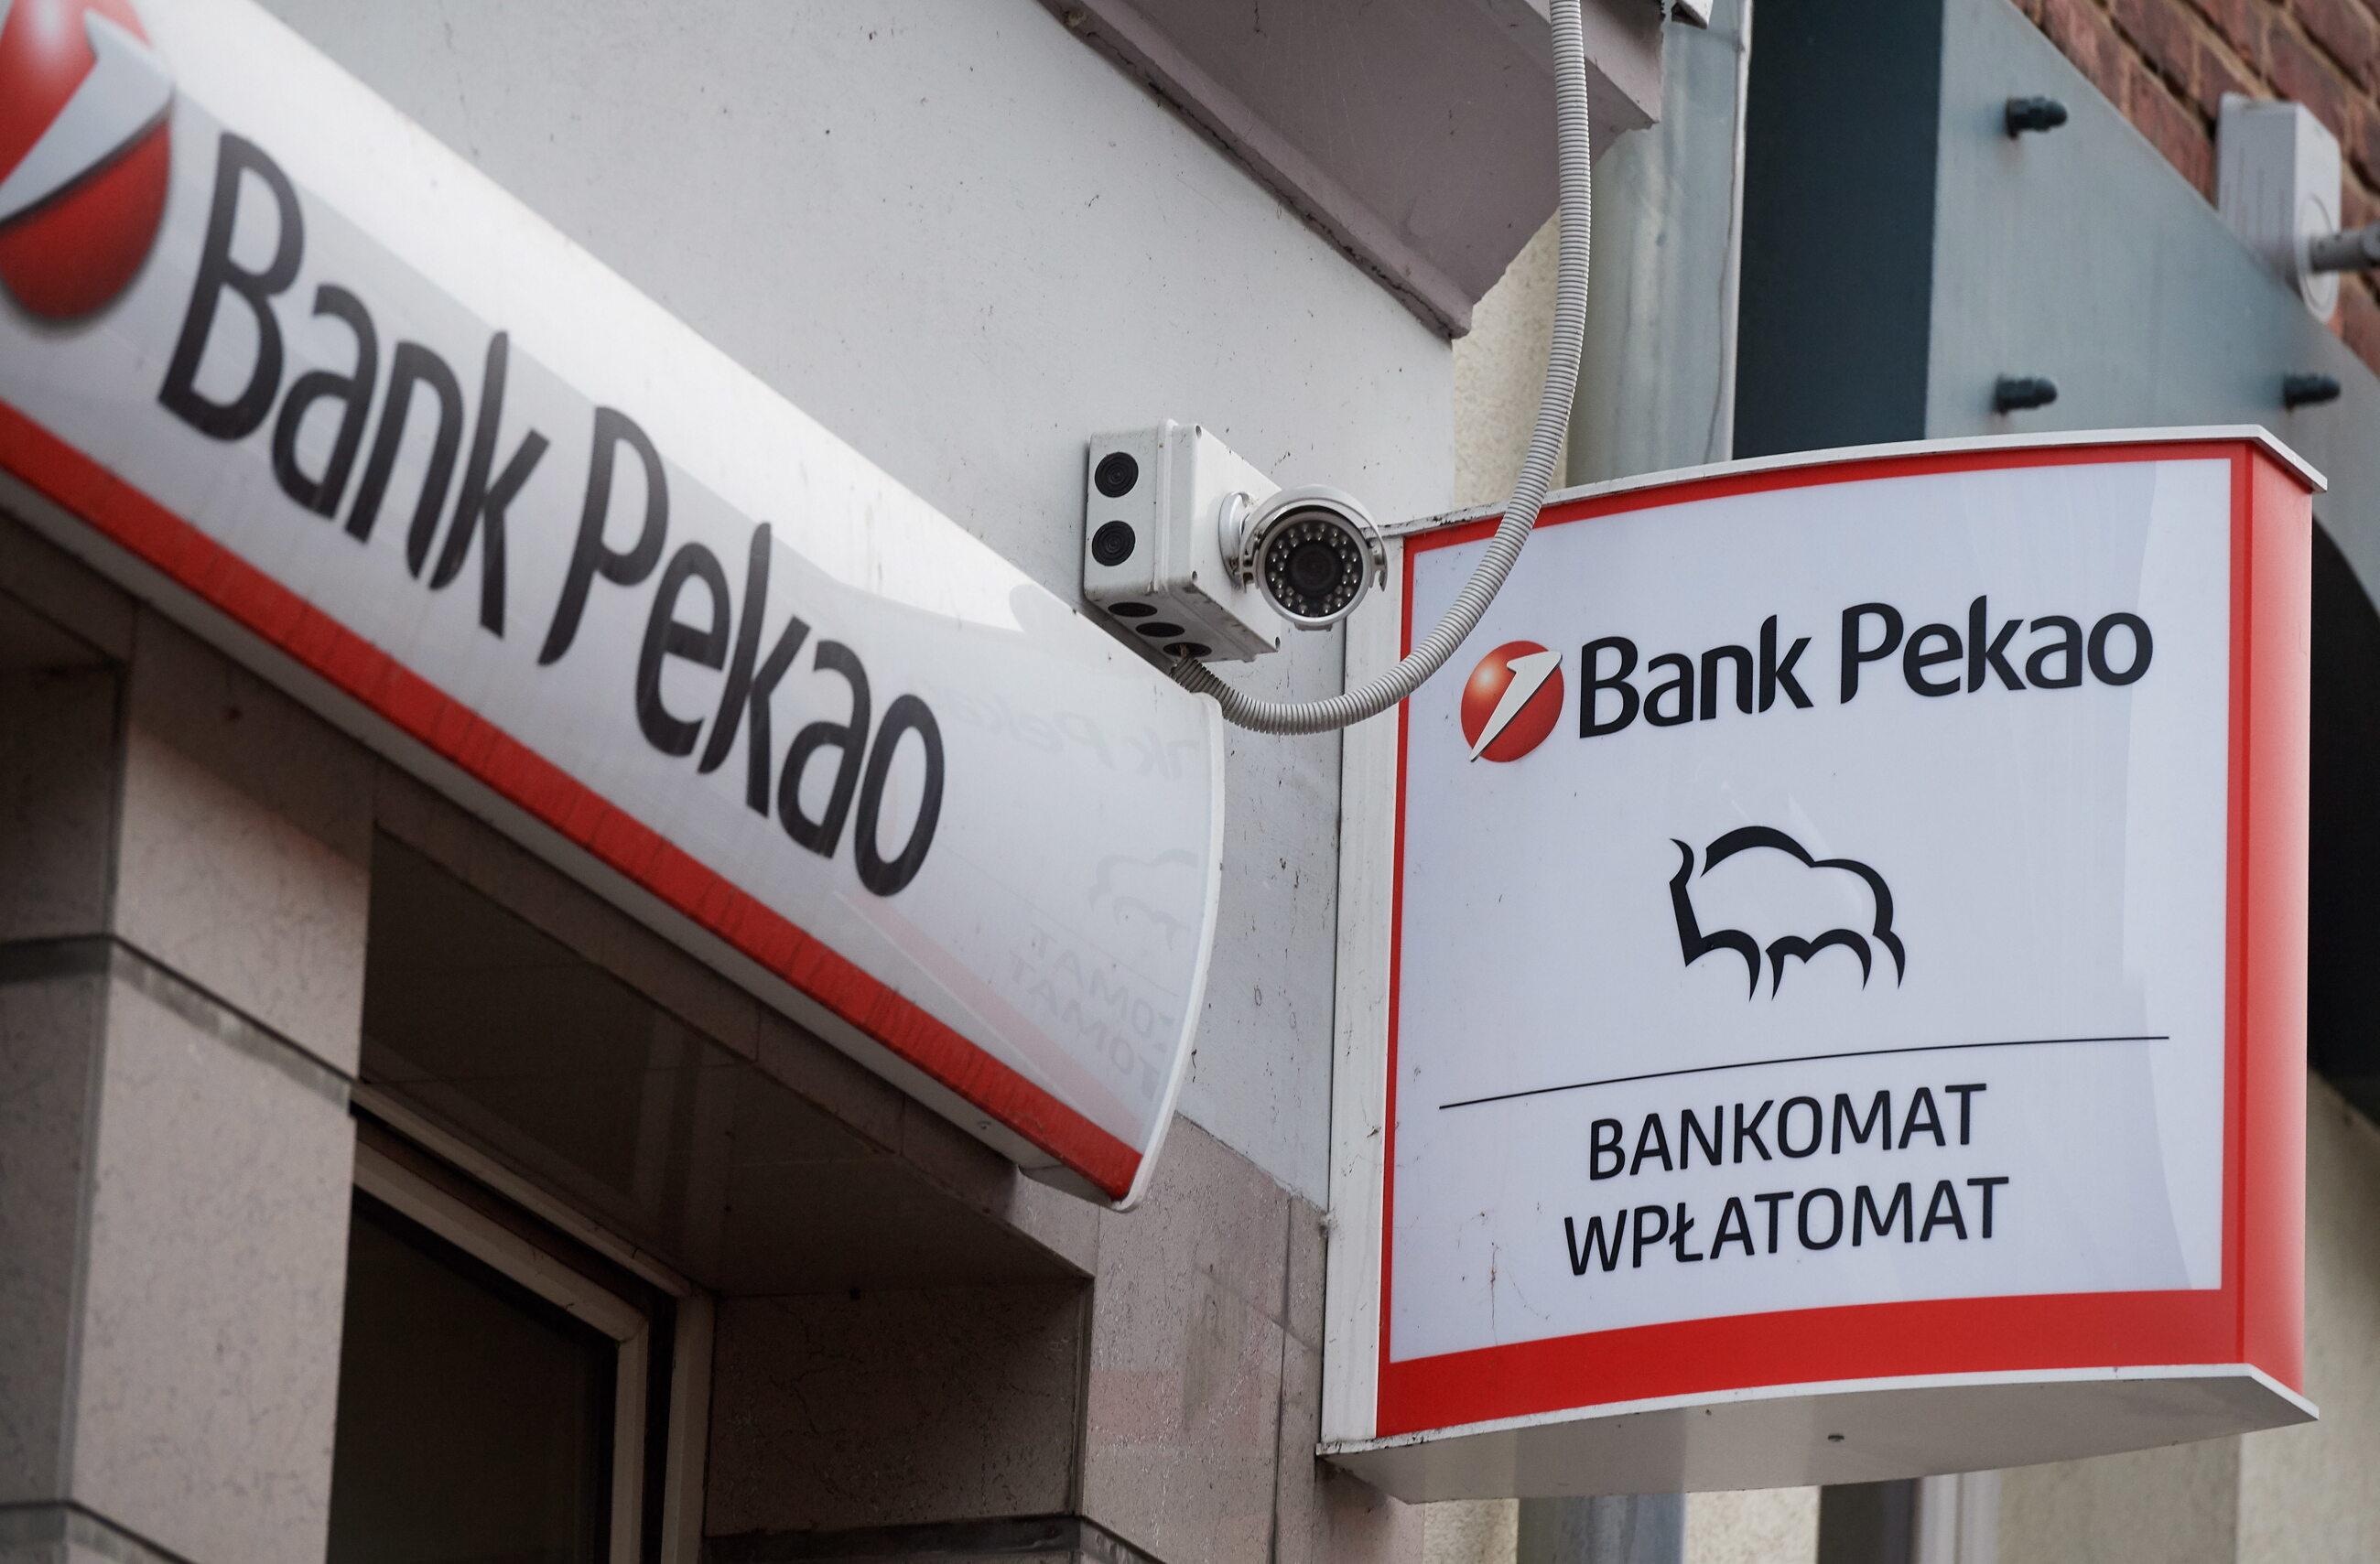 Oddział banku Pekao SA w Gdańsku